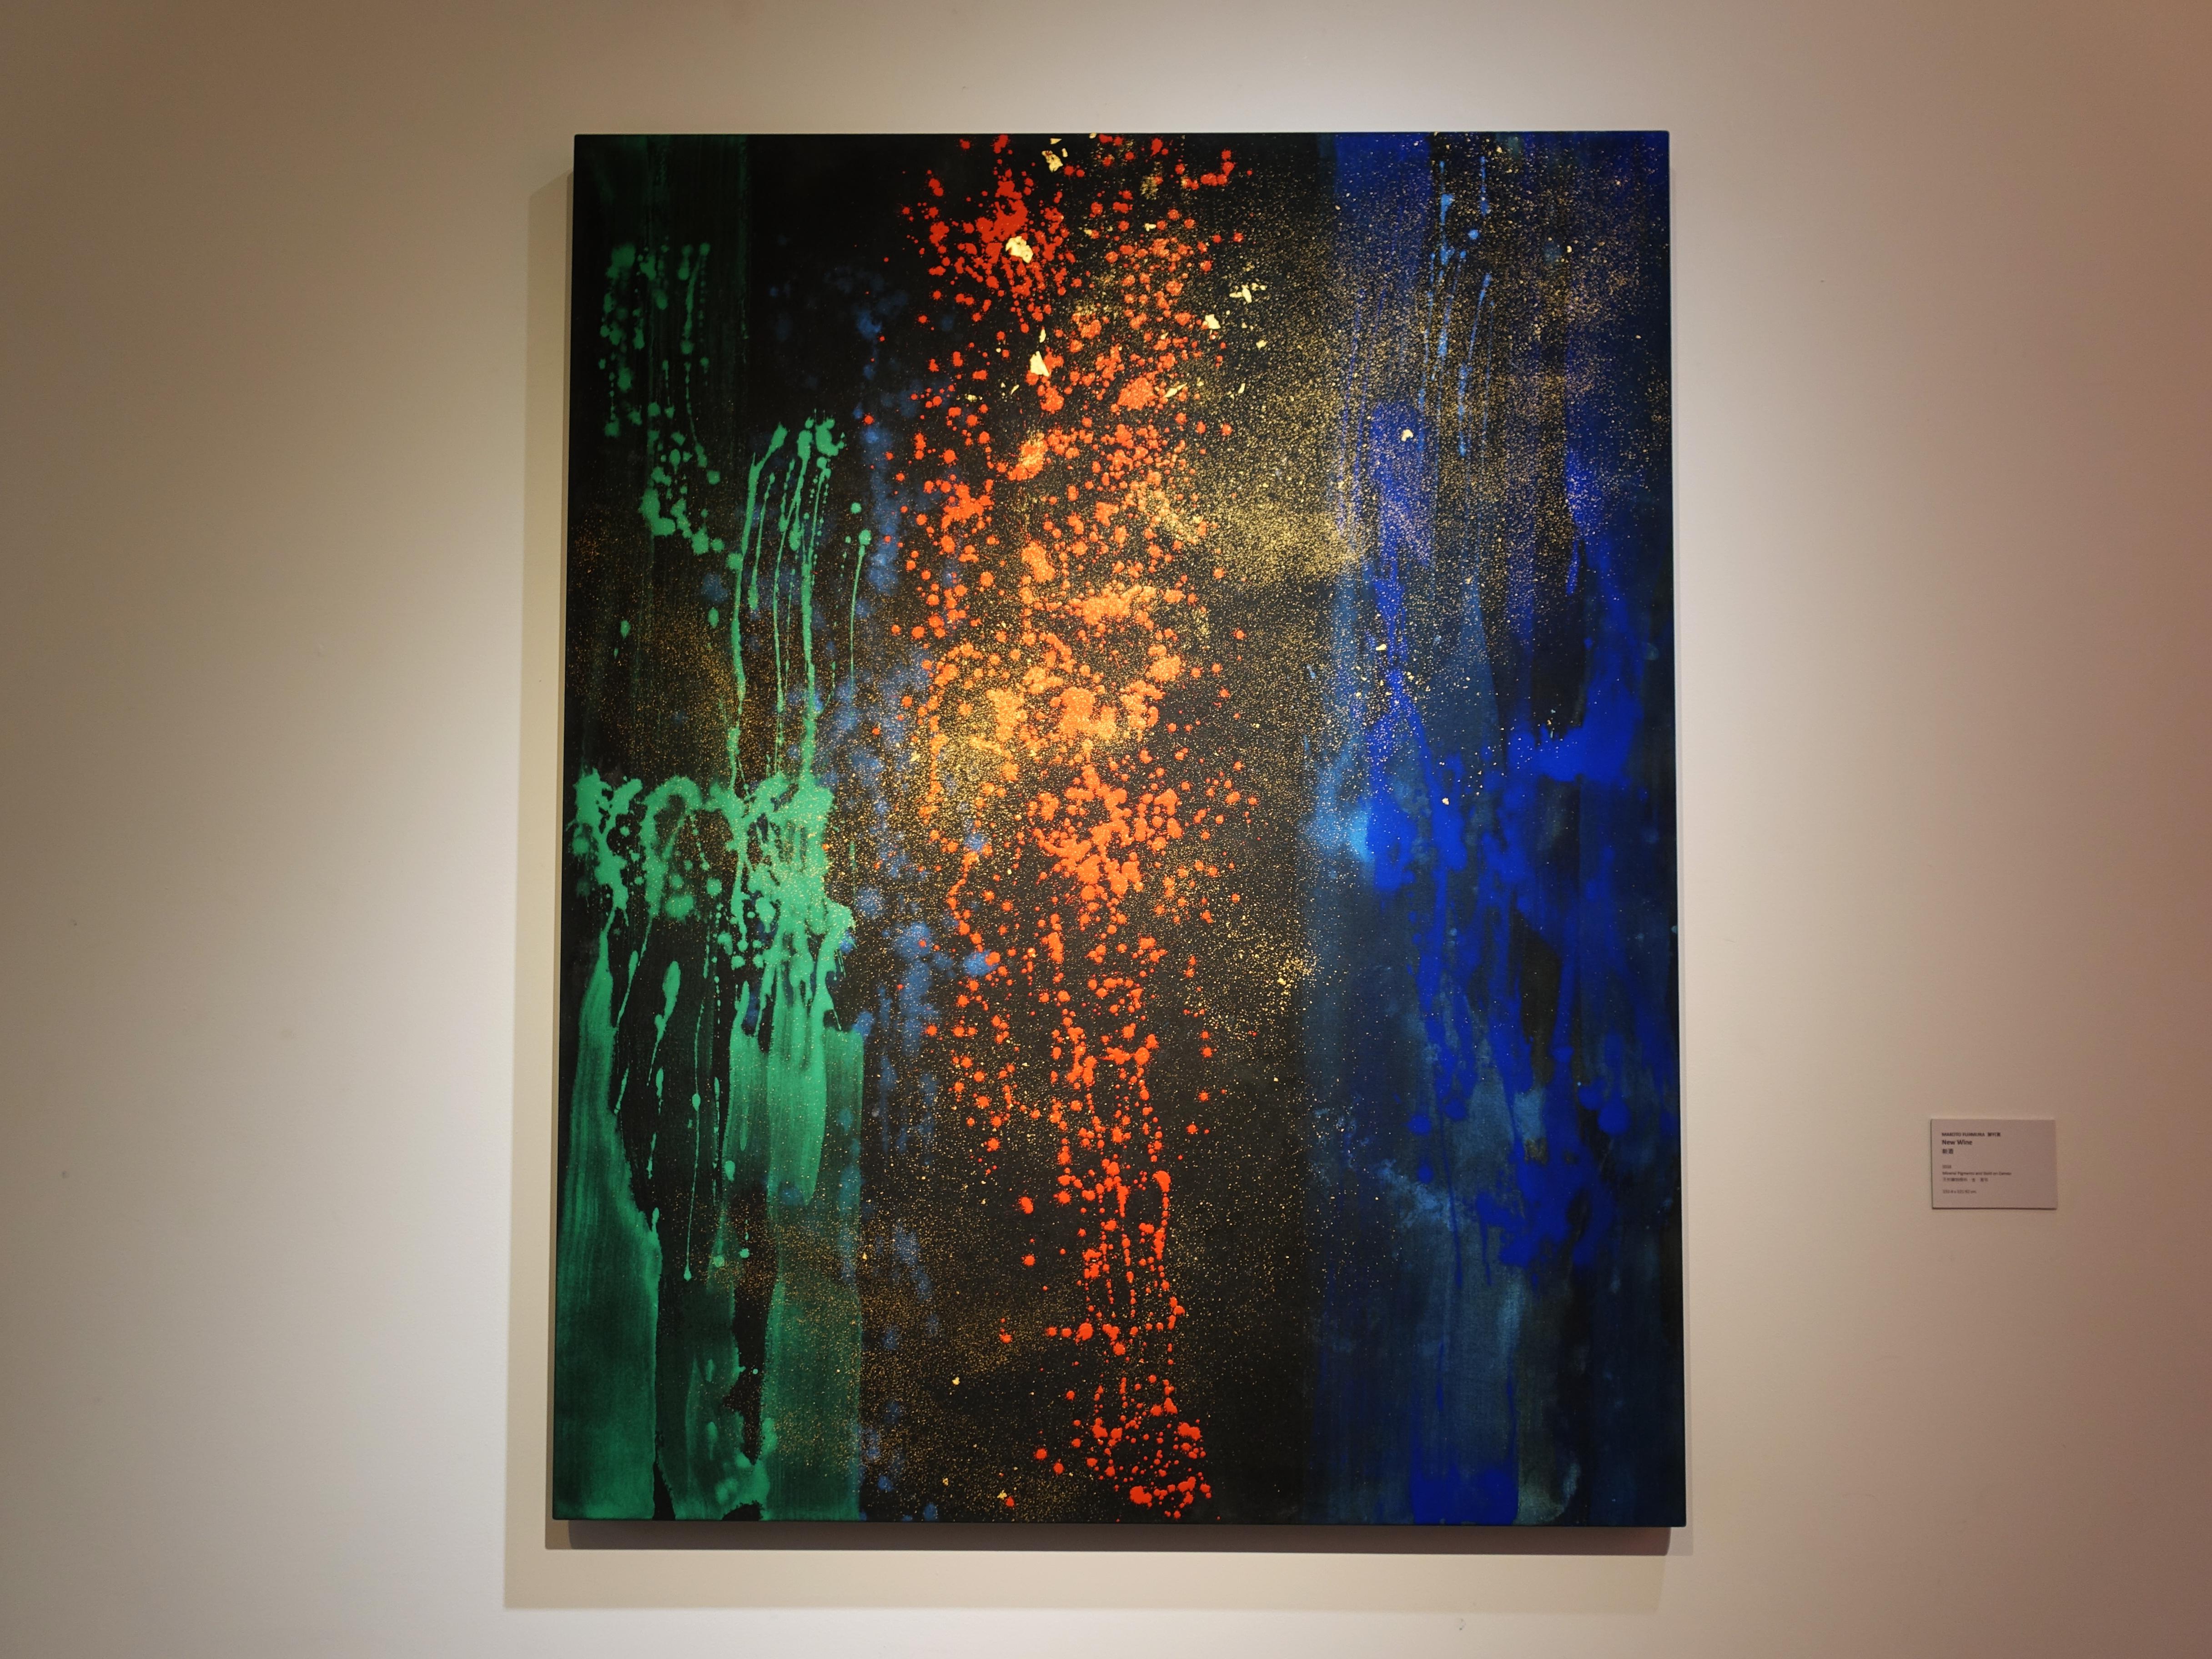 Makoto Fujimura,《New Wine》,152.4 x 121.92 cm,天然礦物顏料、金、畫布,2018。